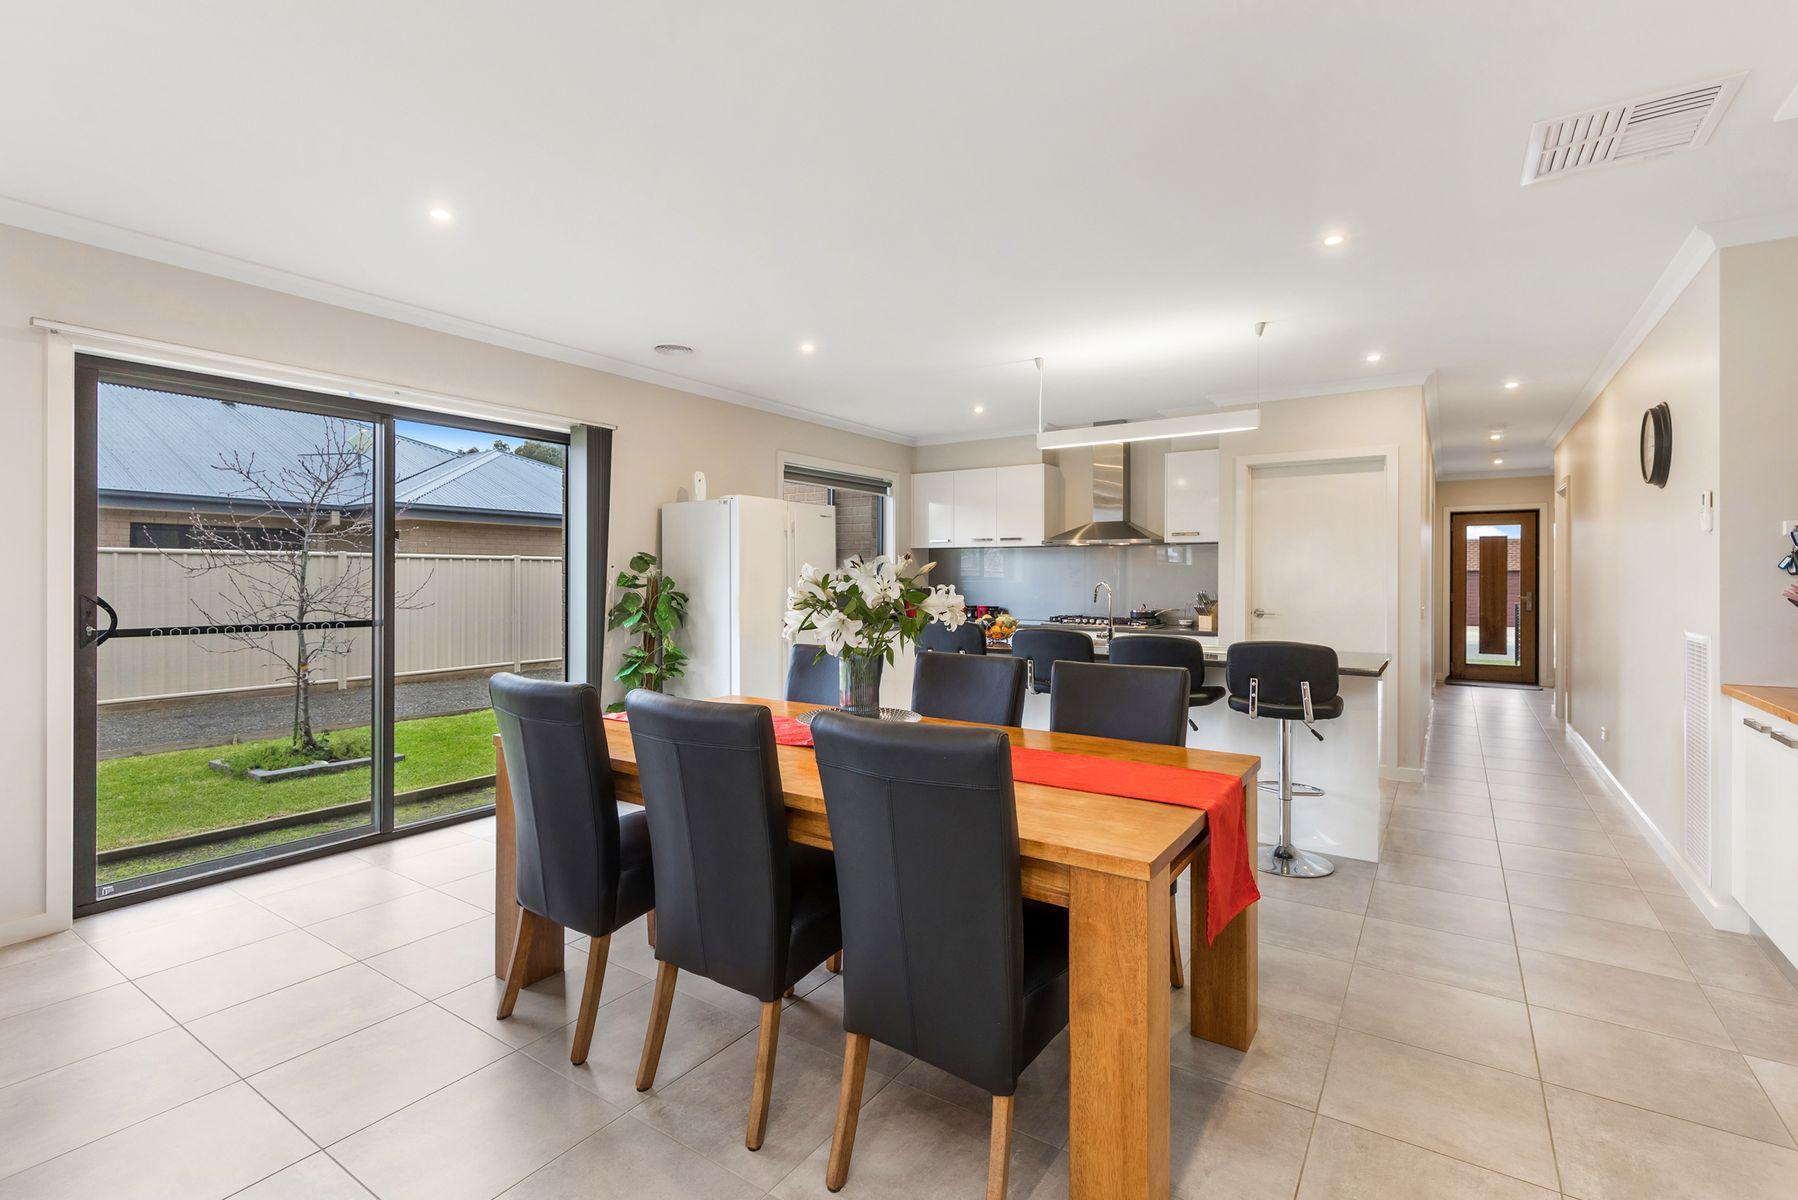 3 Dunvegan Terrace, Strathfieldsaye, VIC 3551